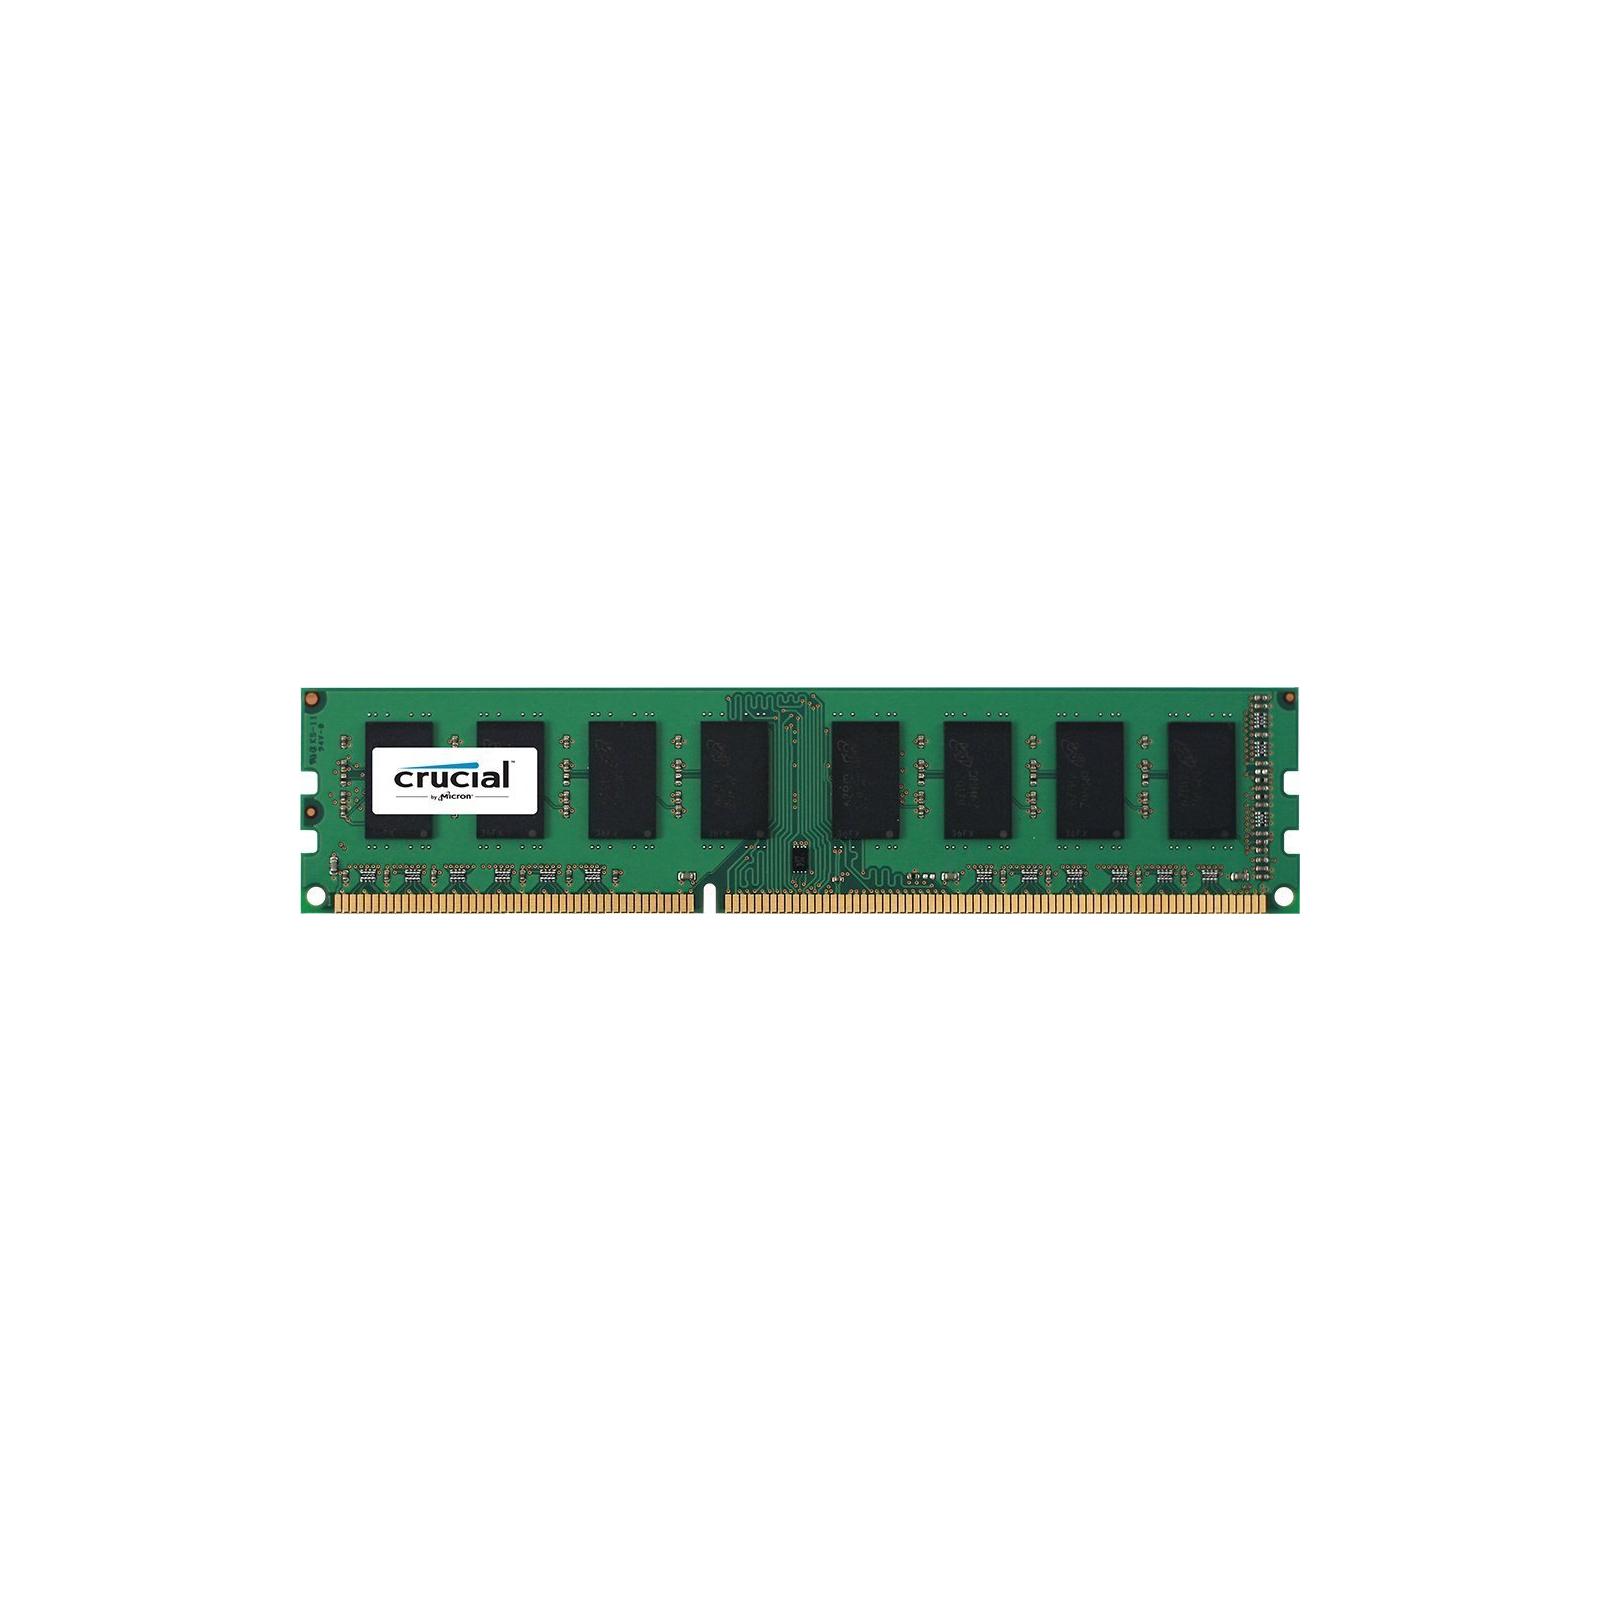 Модуль памяти для компьютера DDR3 4GB 1600 MHz MICRON (CT51264BA160B)